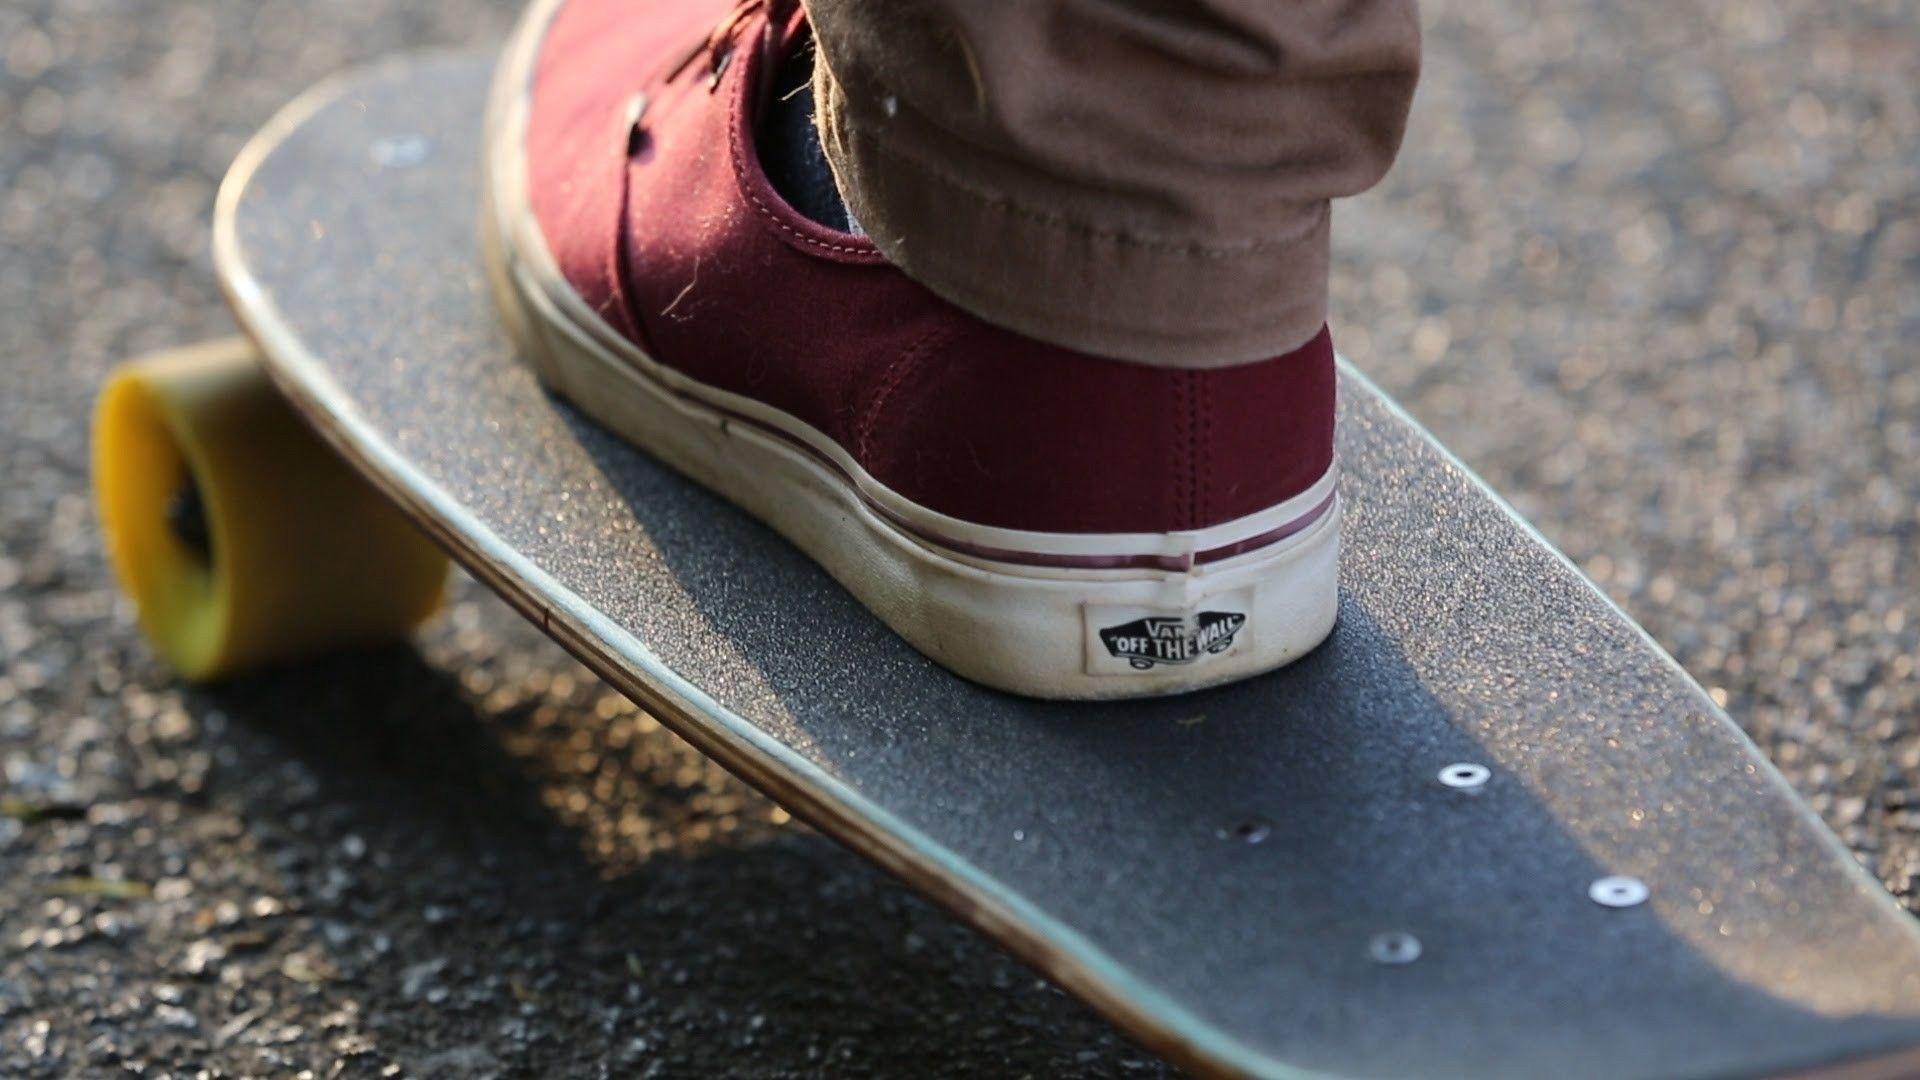 Vans Wallpaper Skateboard - Gambar Sepatu Vans Keren Hd , HD Wallpaper & Backgrounds